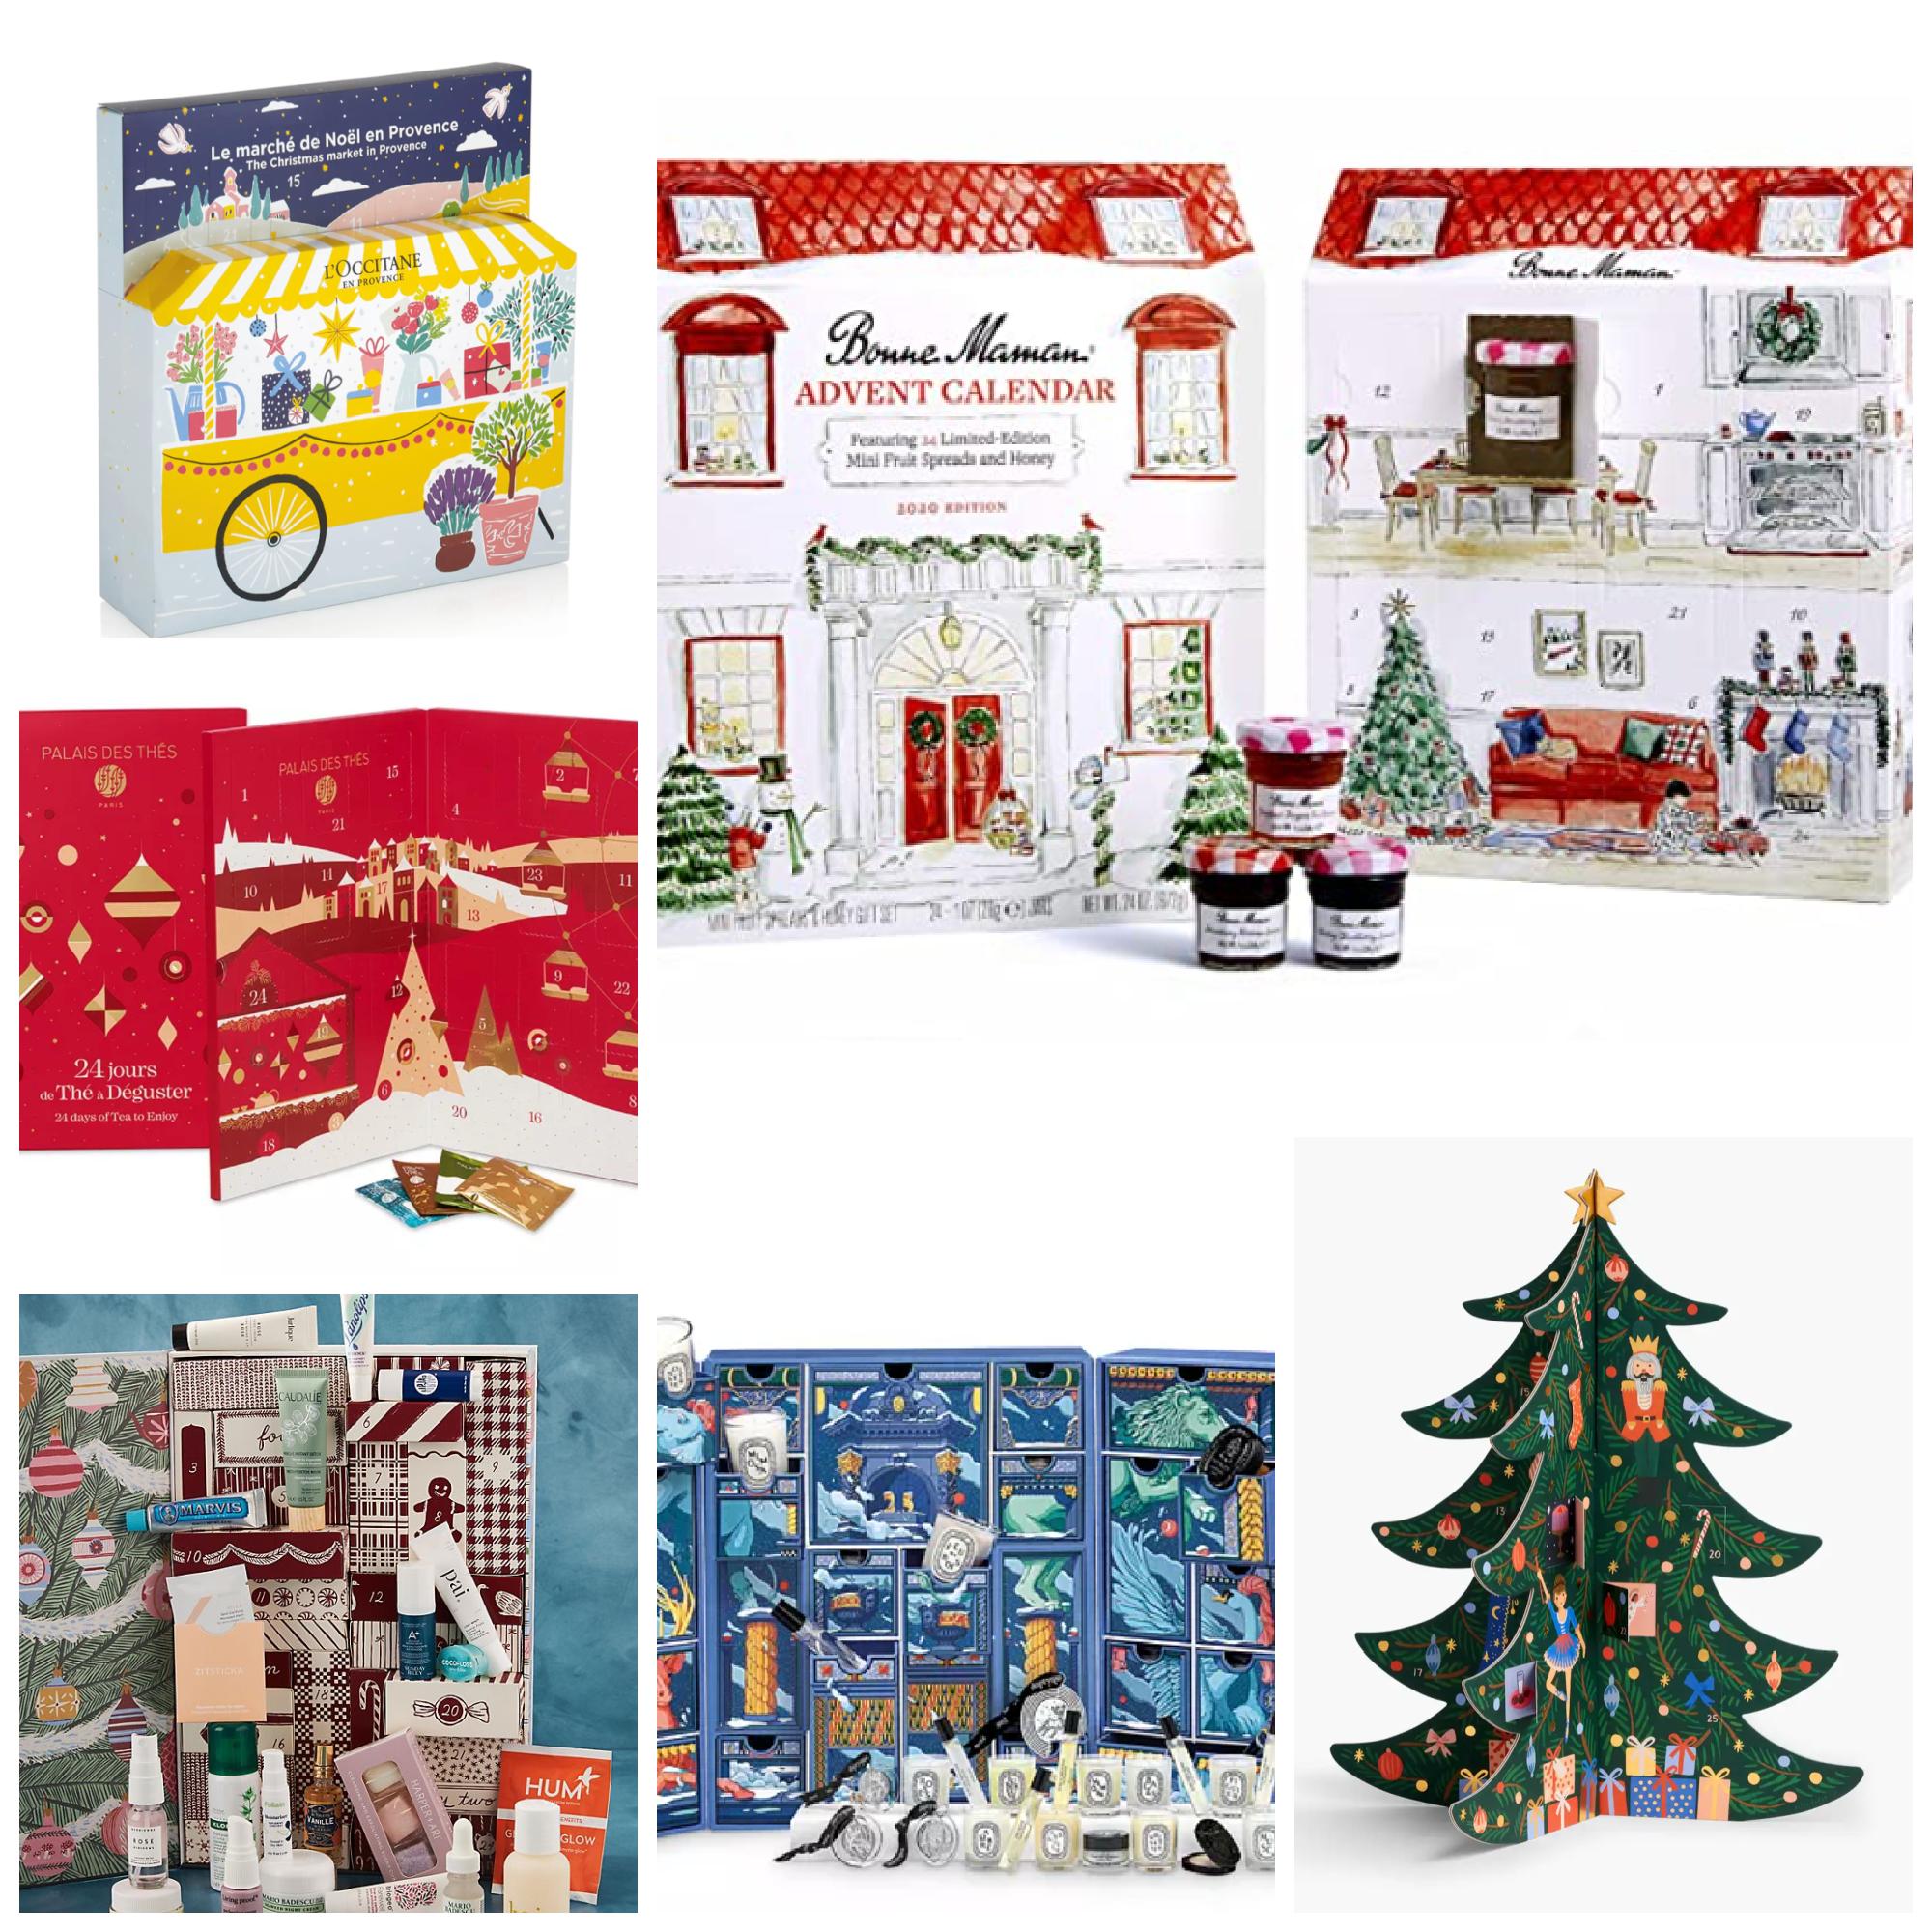 Perision Christmas Tree Decorating Ideas 2020 francophile gift ideas — Every Day Parisian — Every Day Parisian